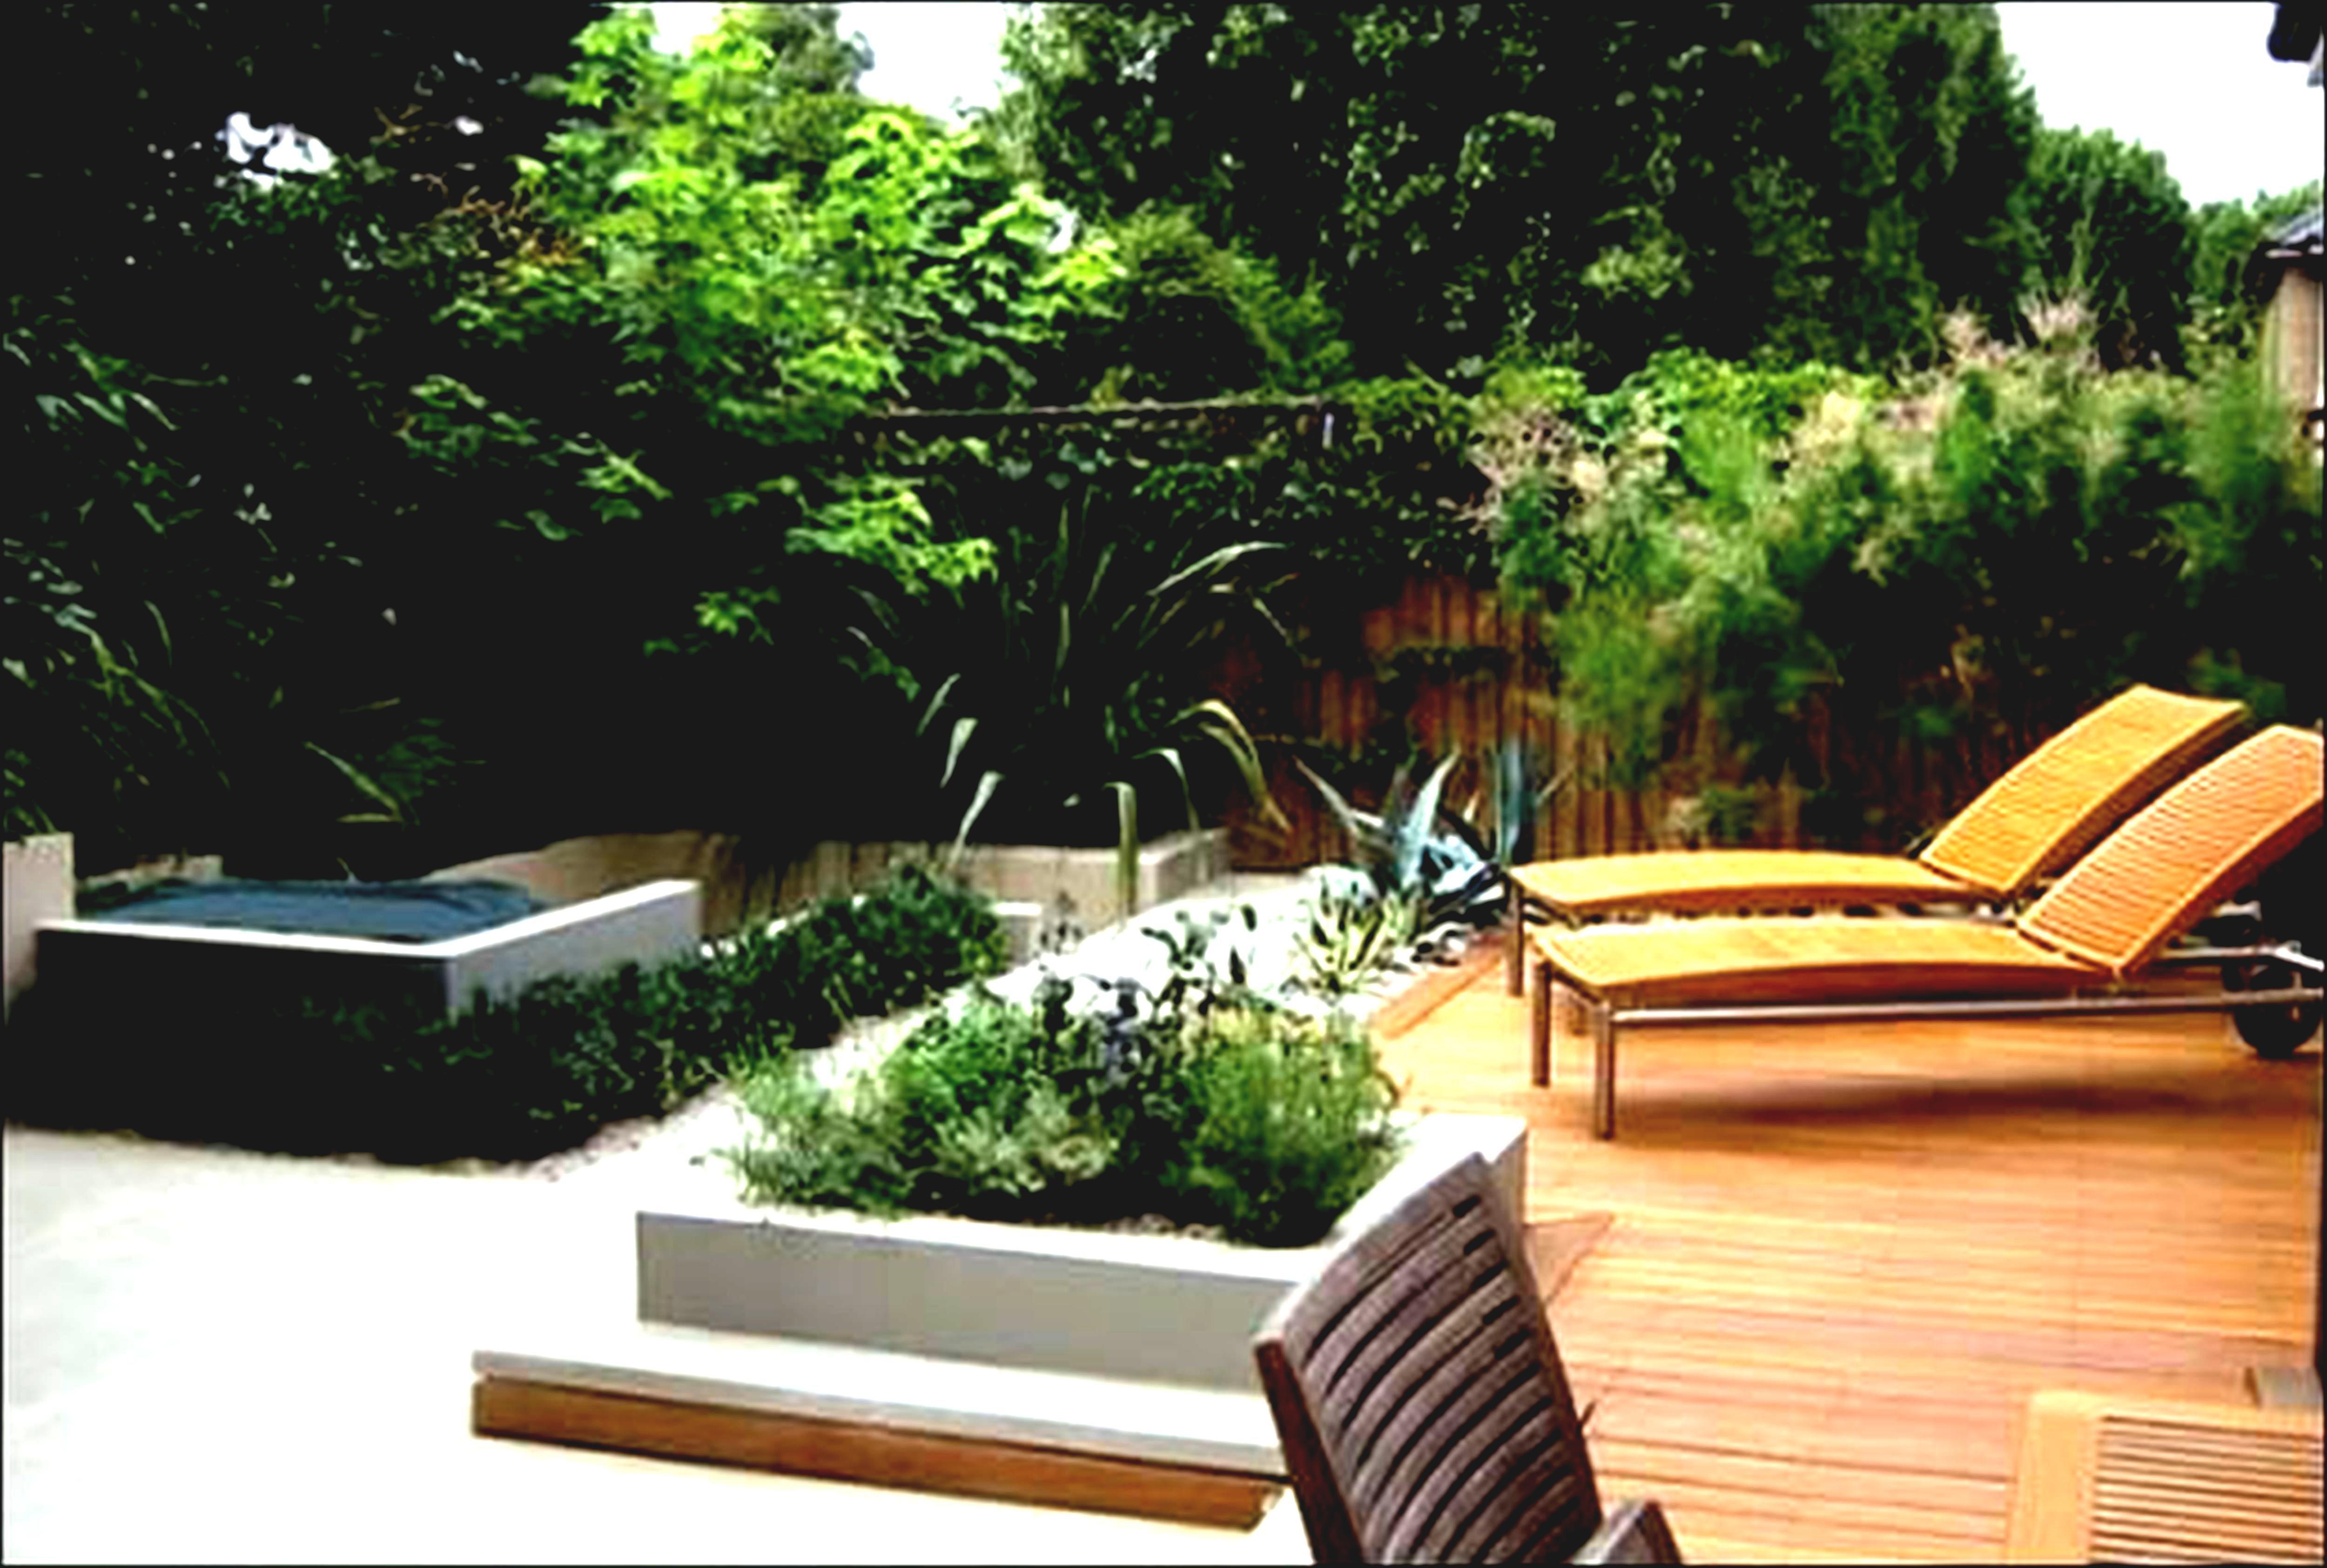 Elegant Genial Garten Design Ideen Bilder #Gartendeko